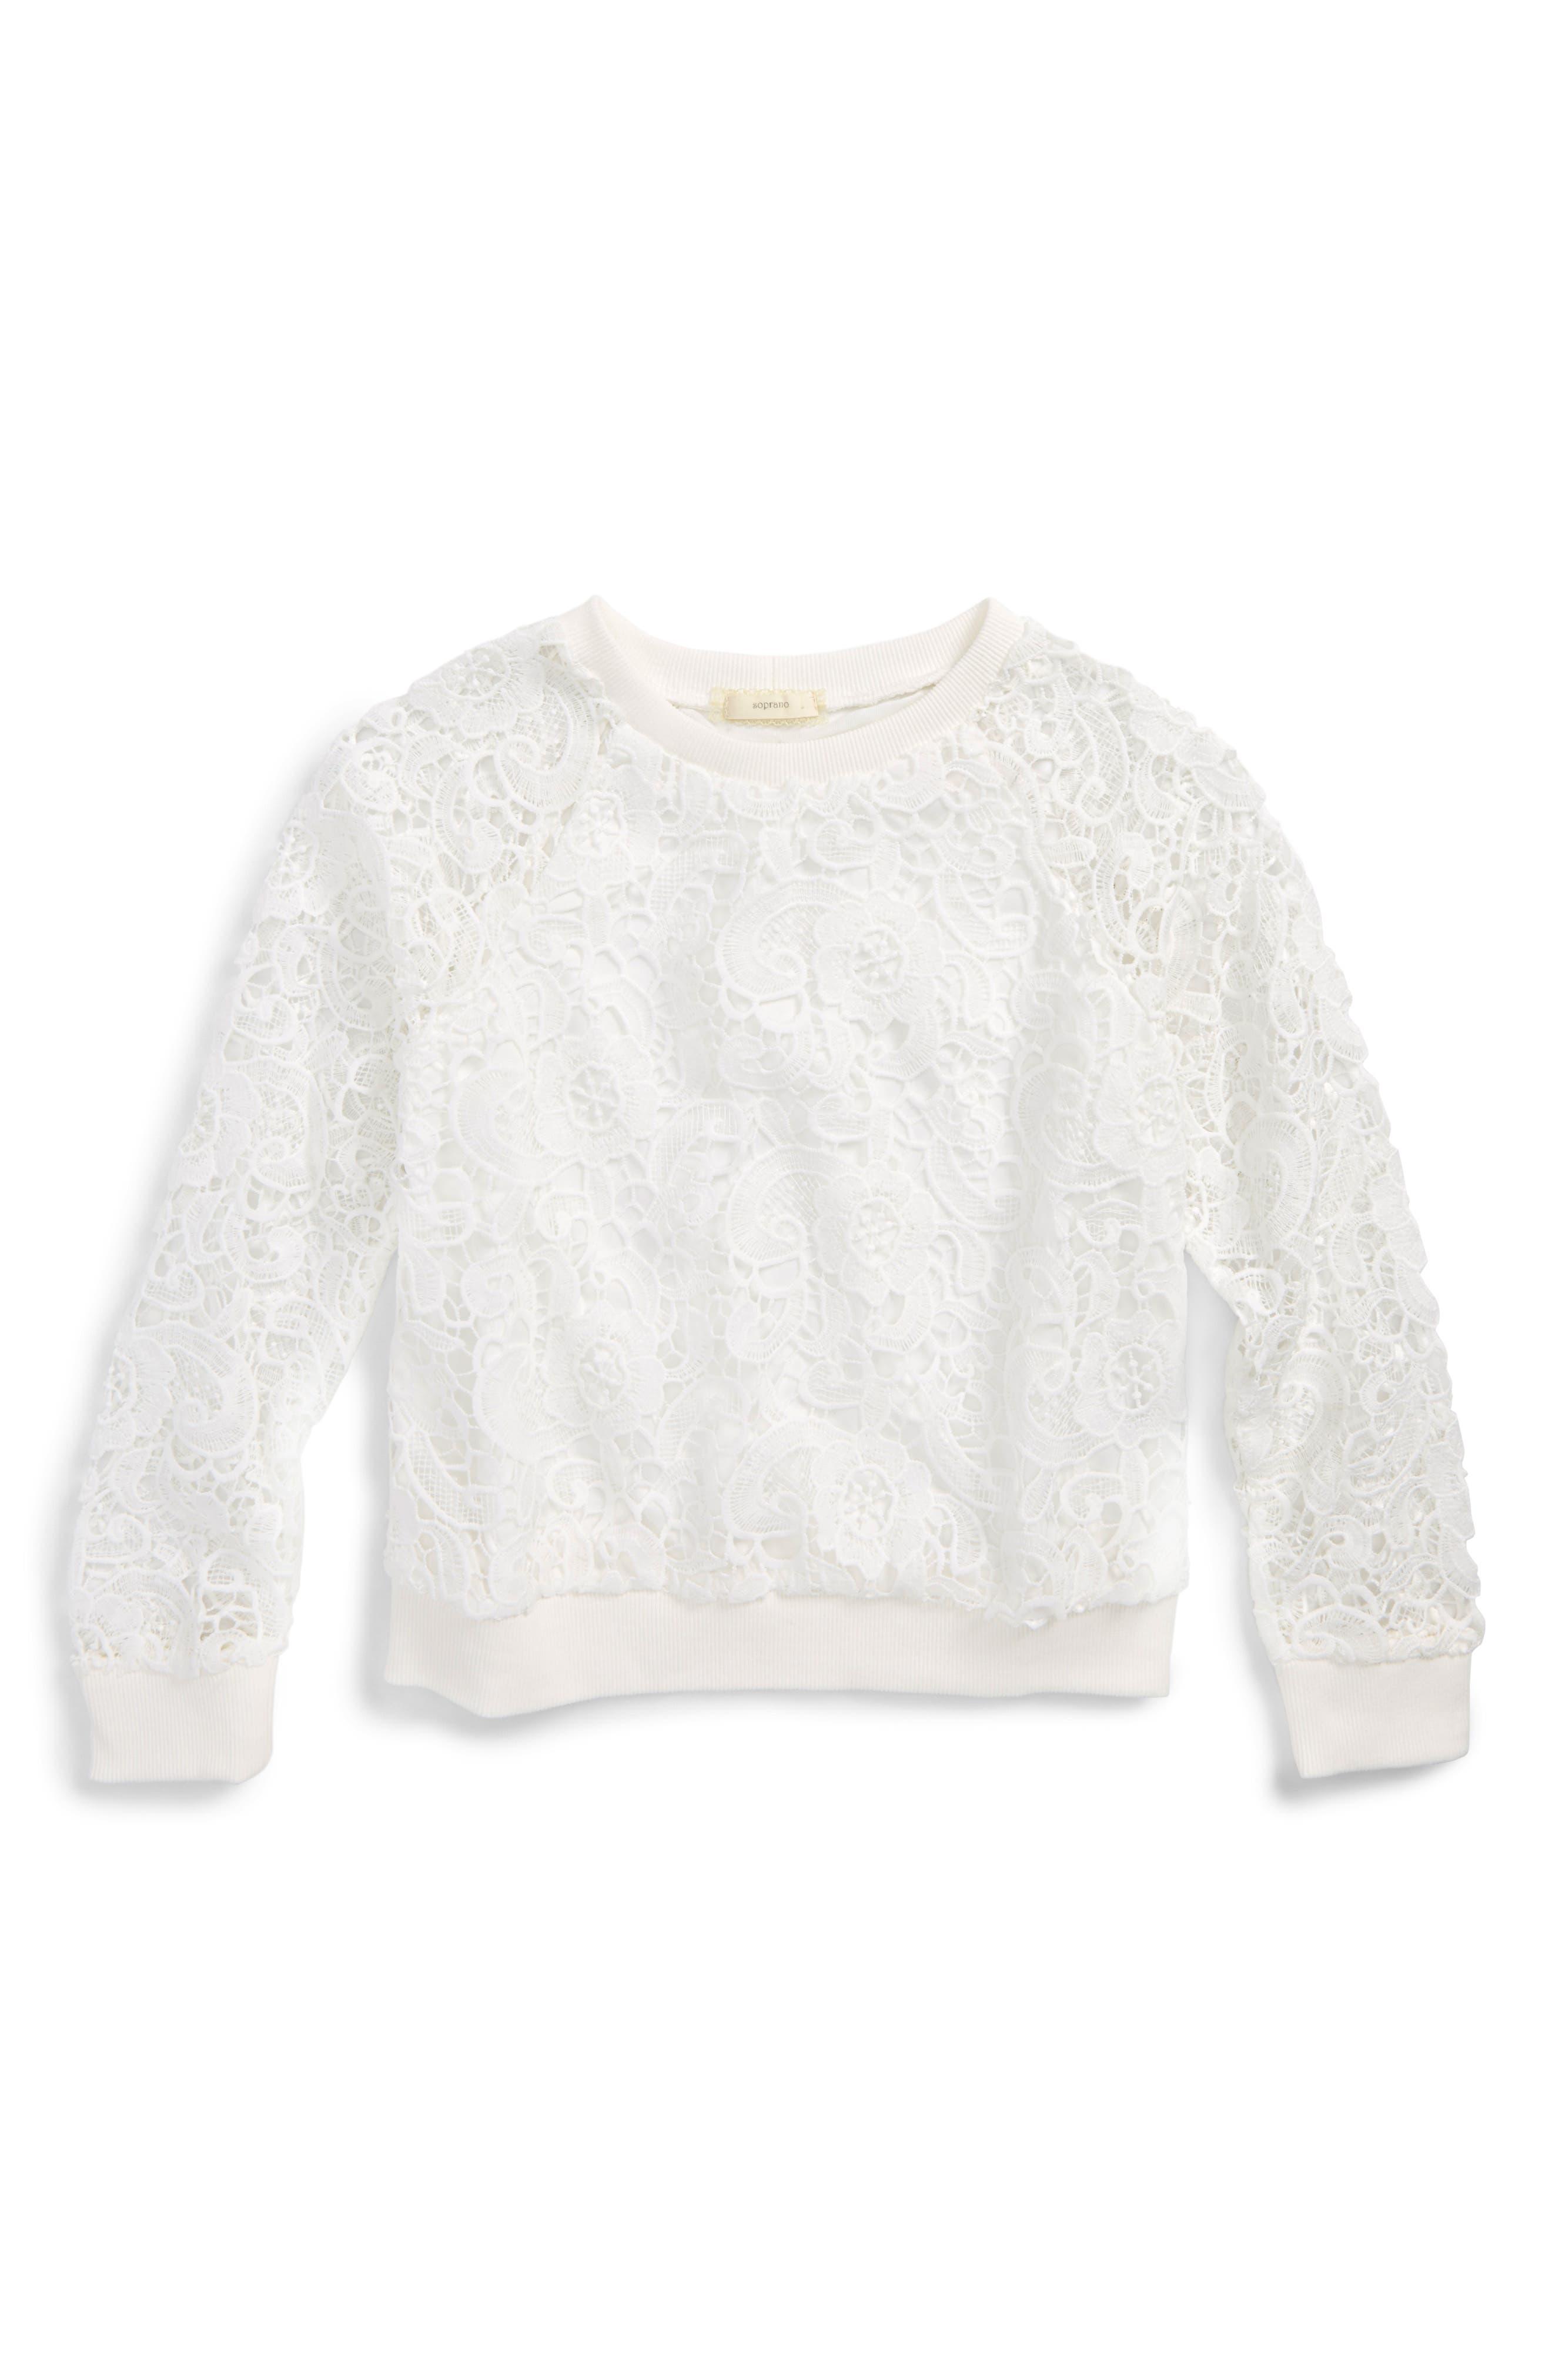 Soprano Lace Overlay Sweatshirt (Big Girls)